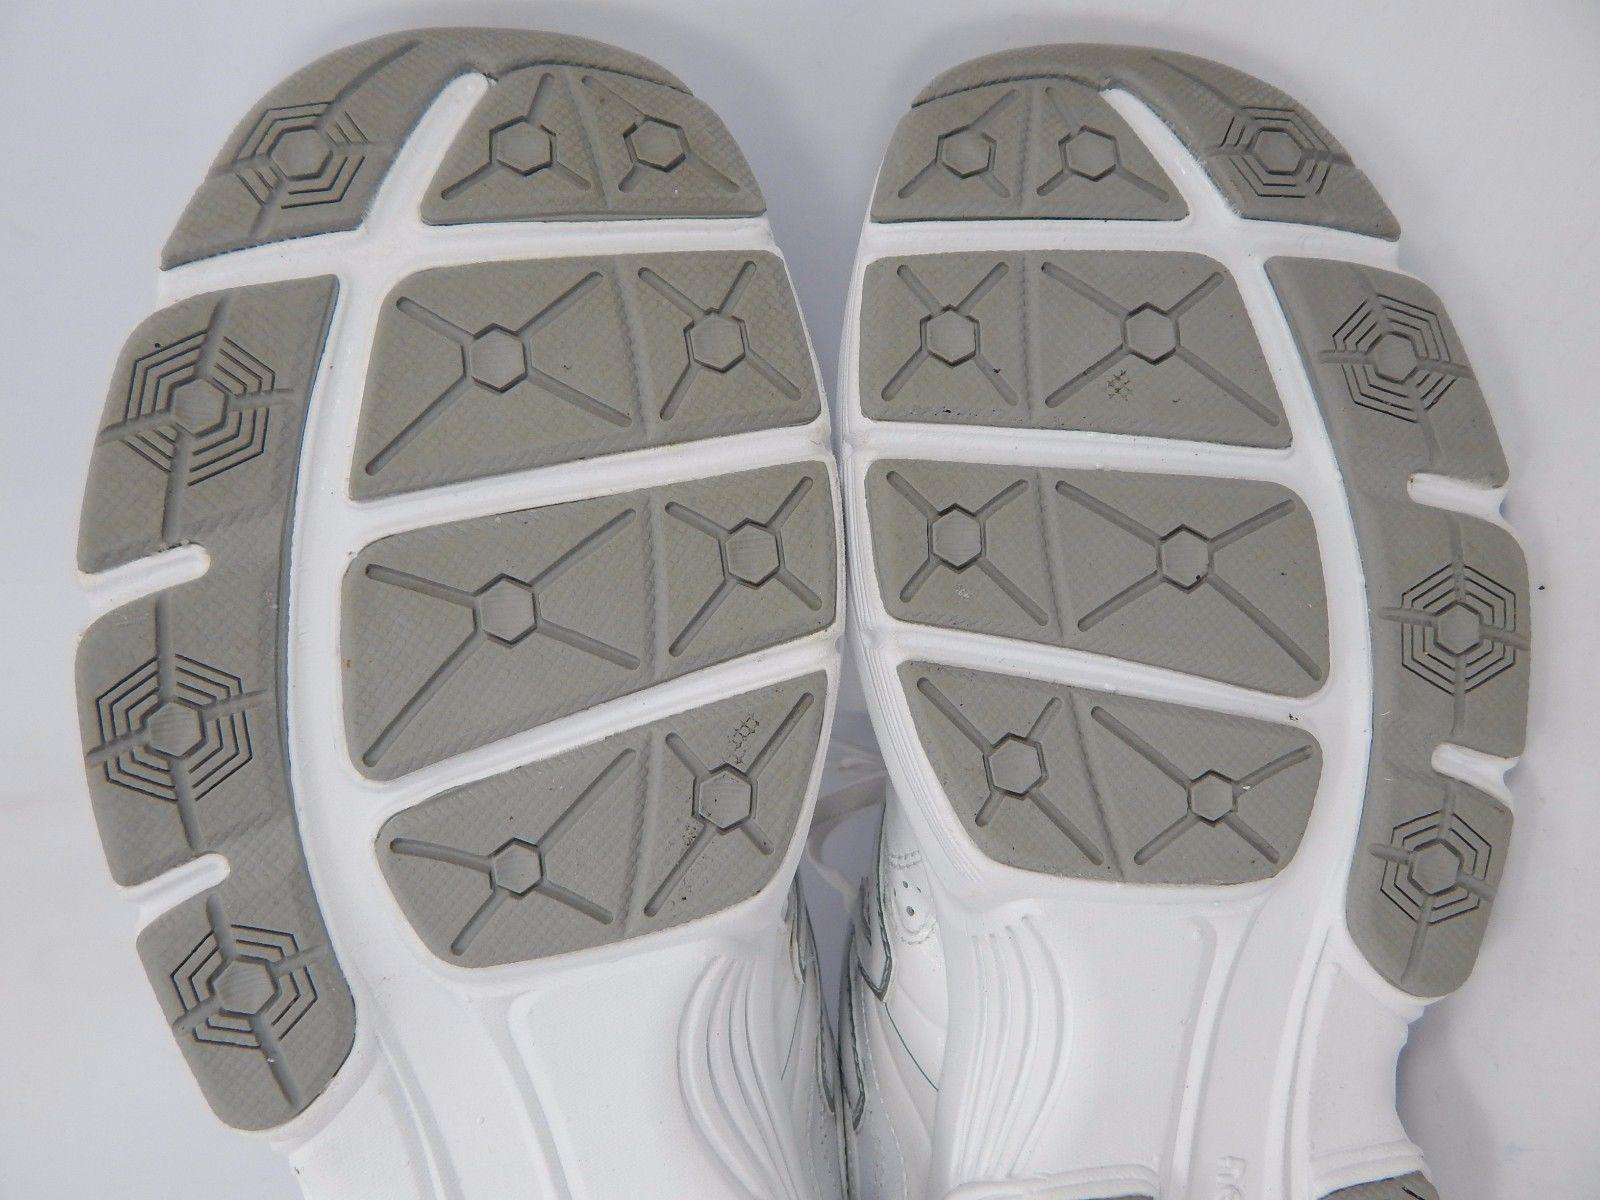 New Balance 633 Women's Running Shoes Size US 10 D WIDE EU 41.5 White WX633WT